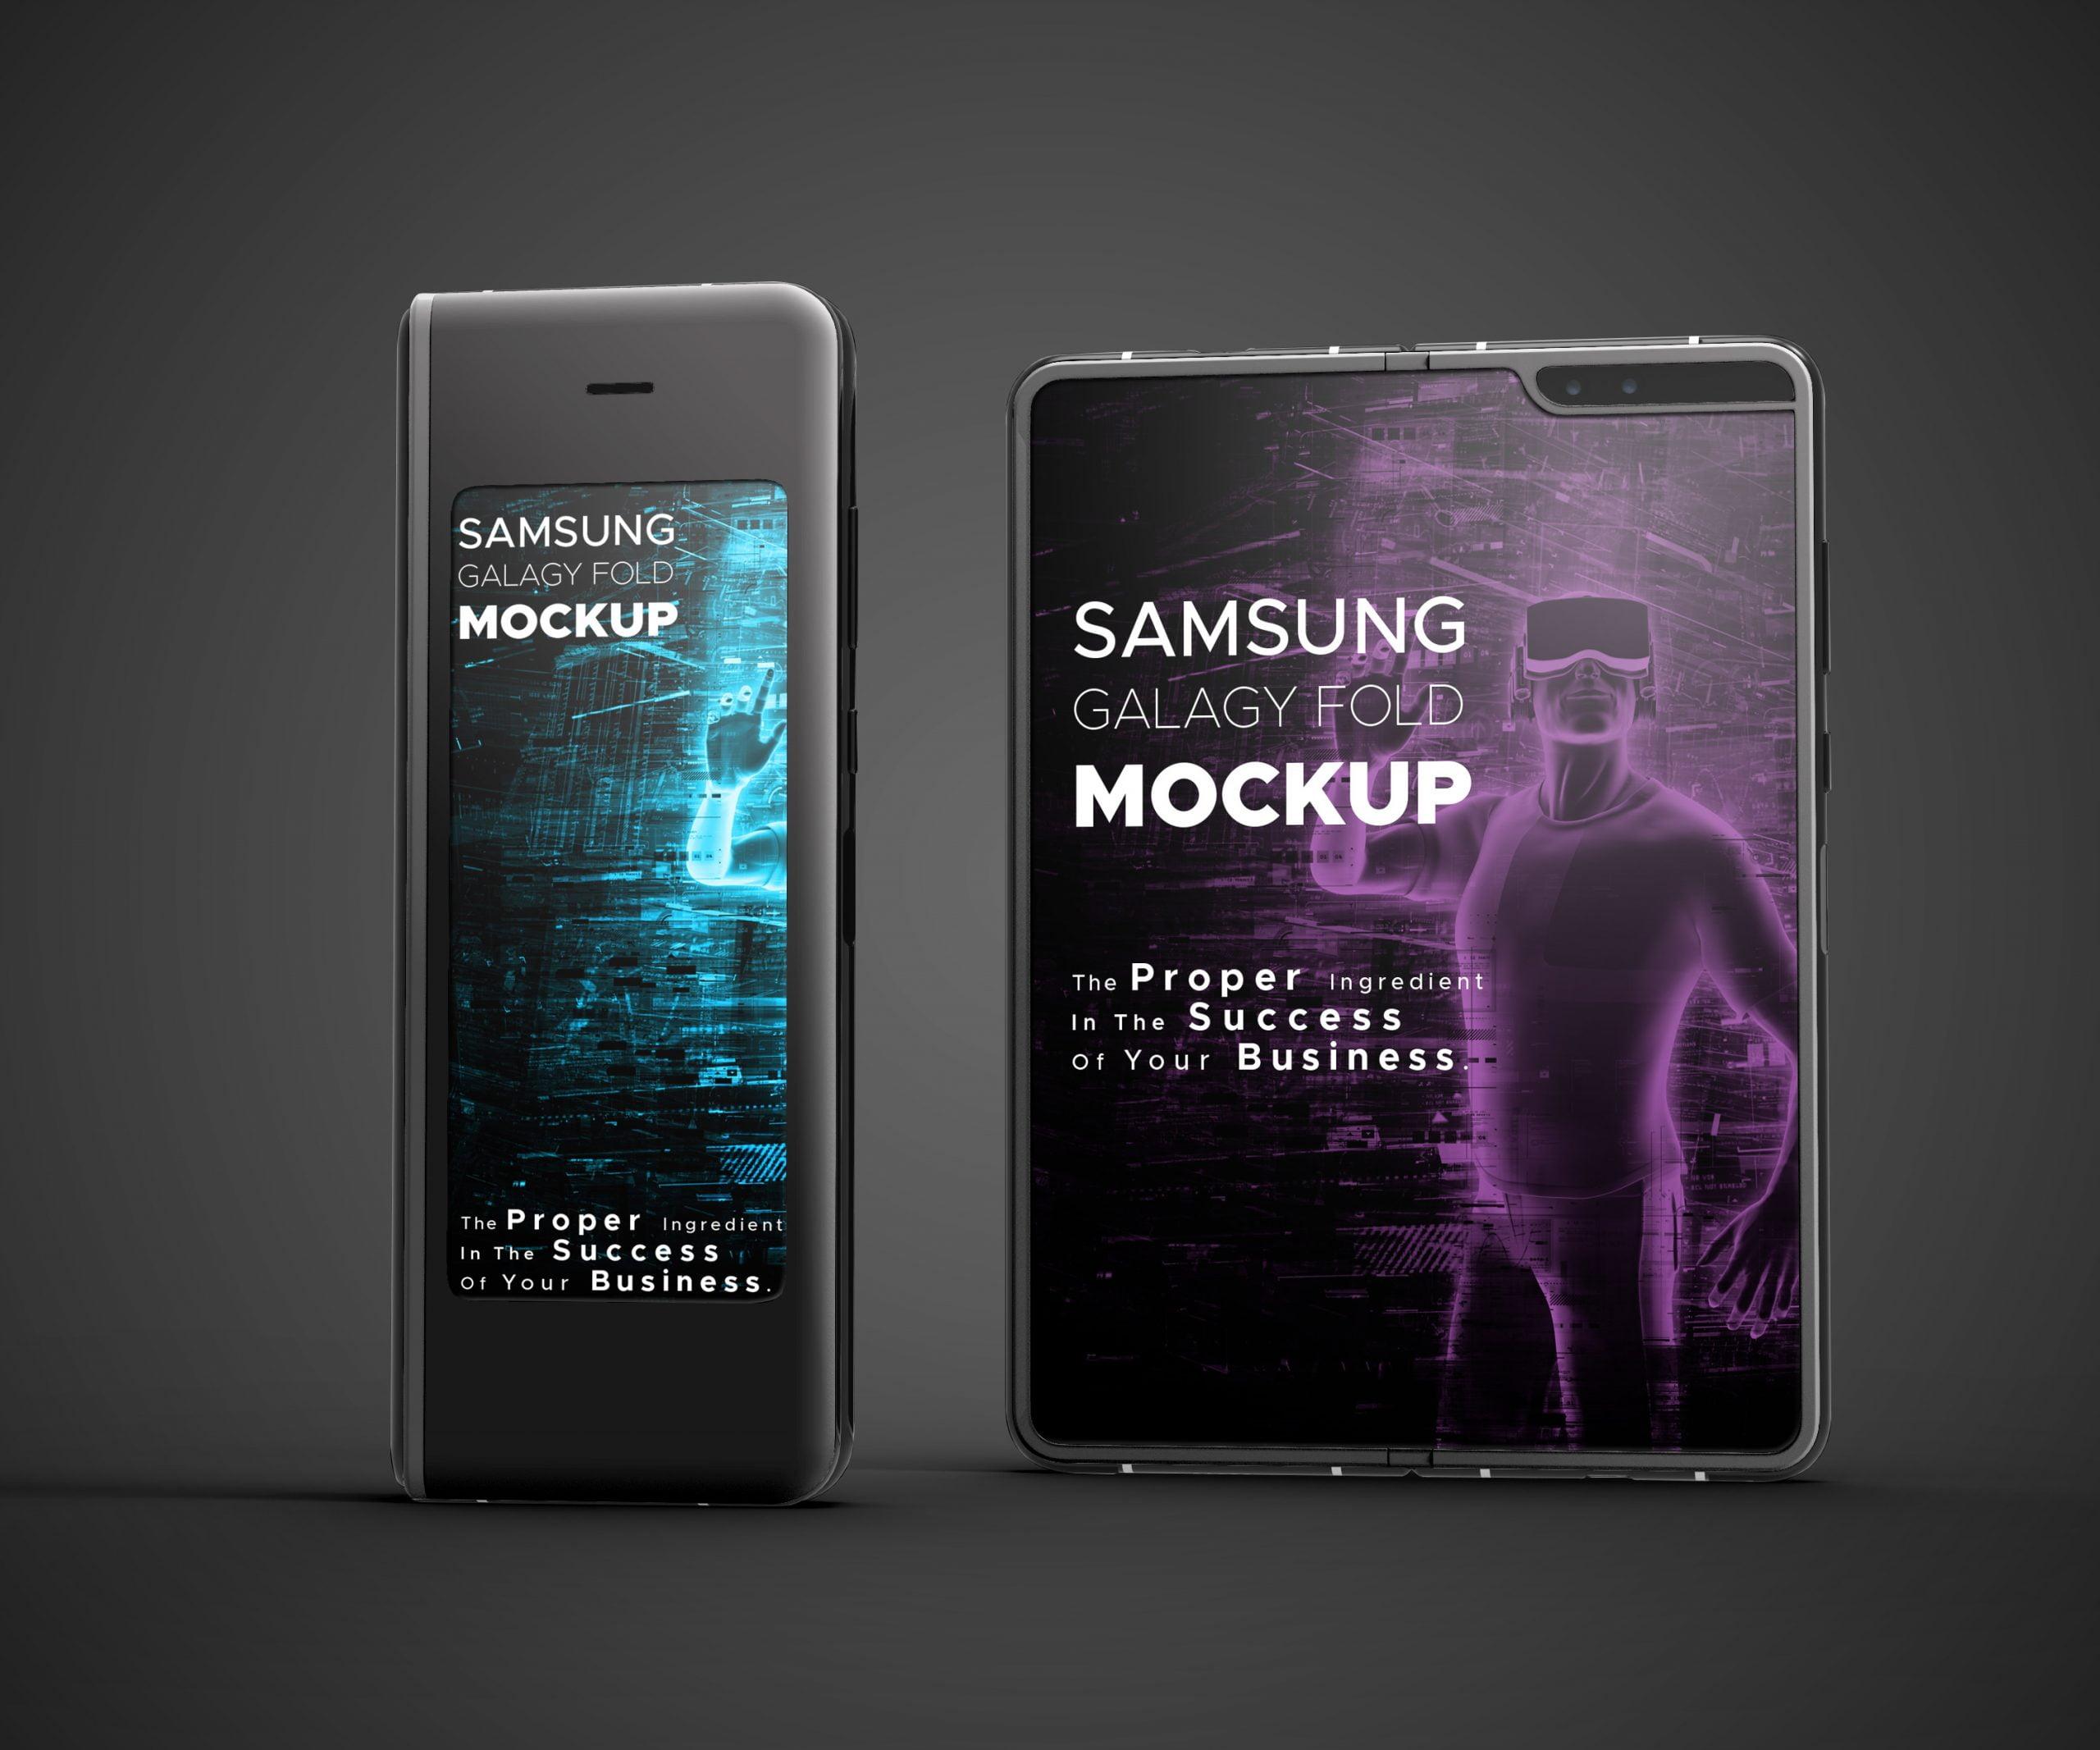 Free-Download-Samsung-Galaxy-Fold-Mockup